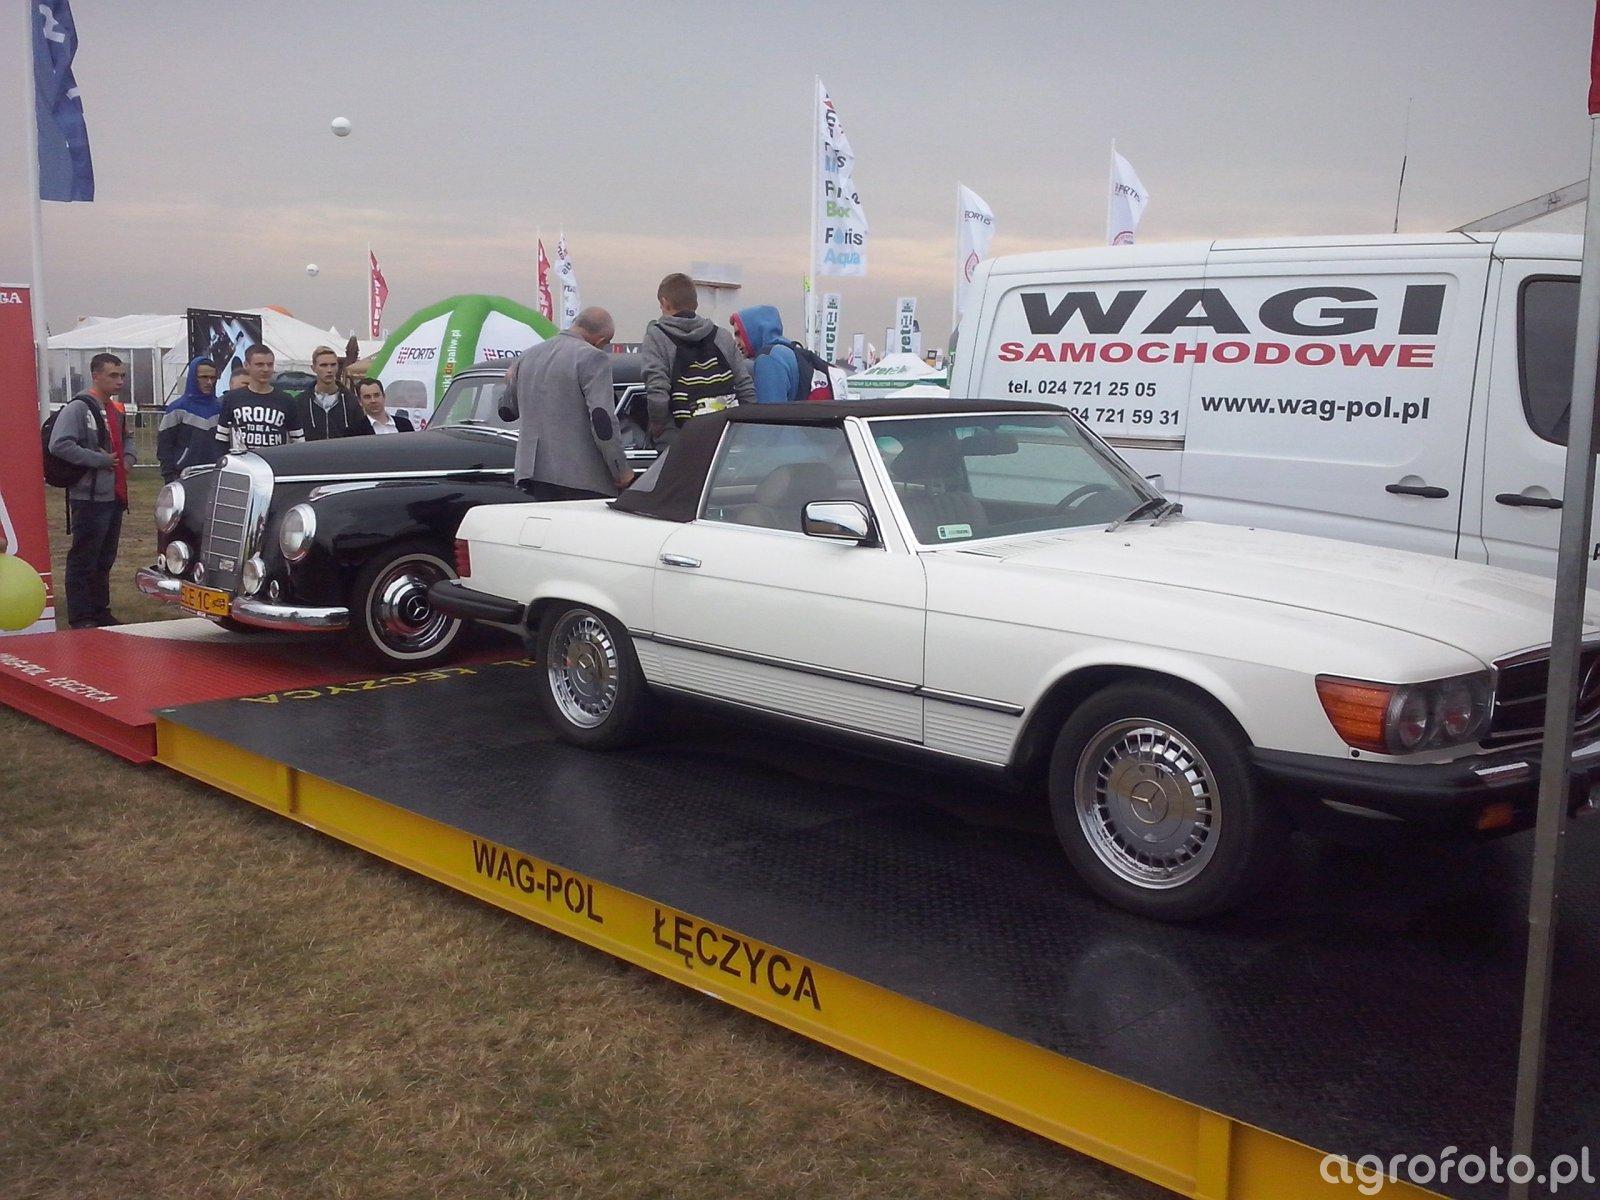 Mercedesy na stoisku Wag-Pol